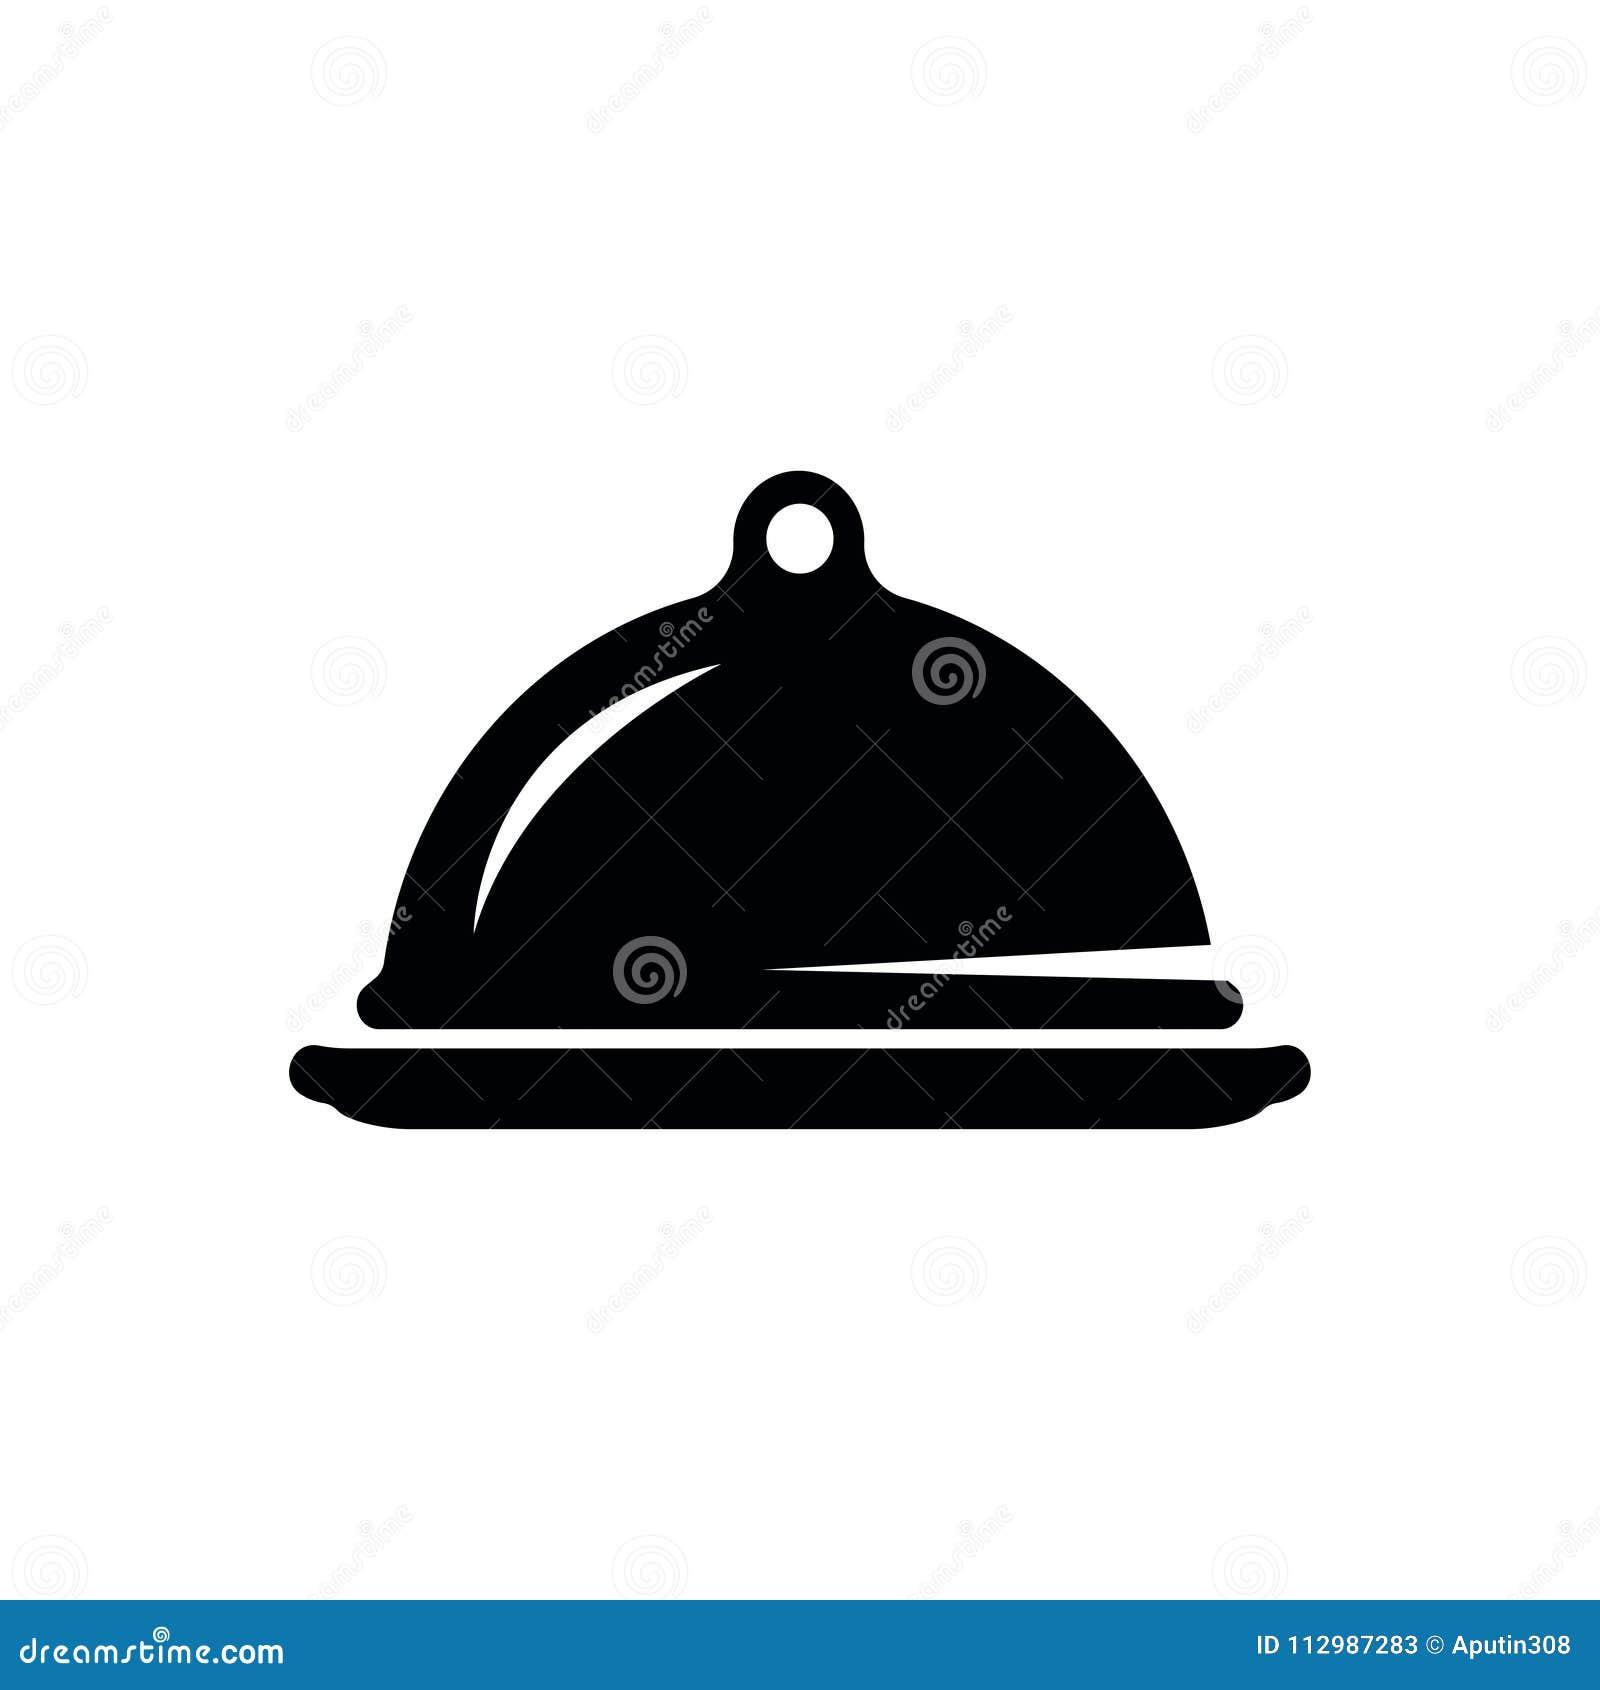 Tray-dish web icon vector. black isolated